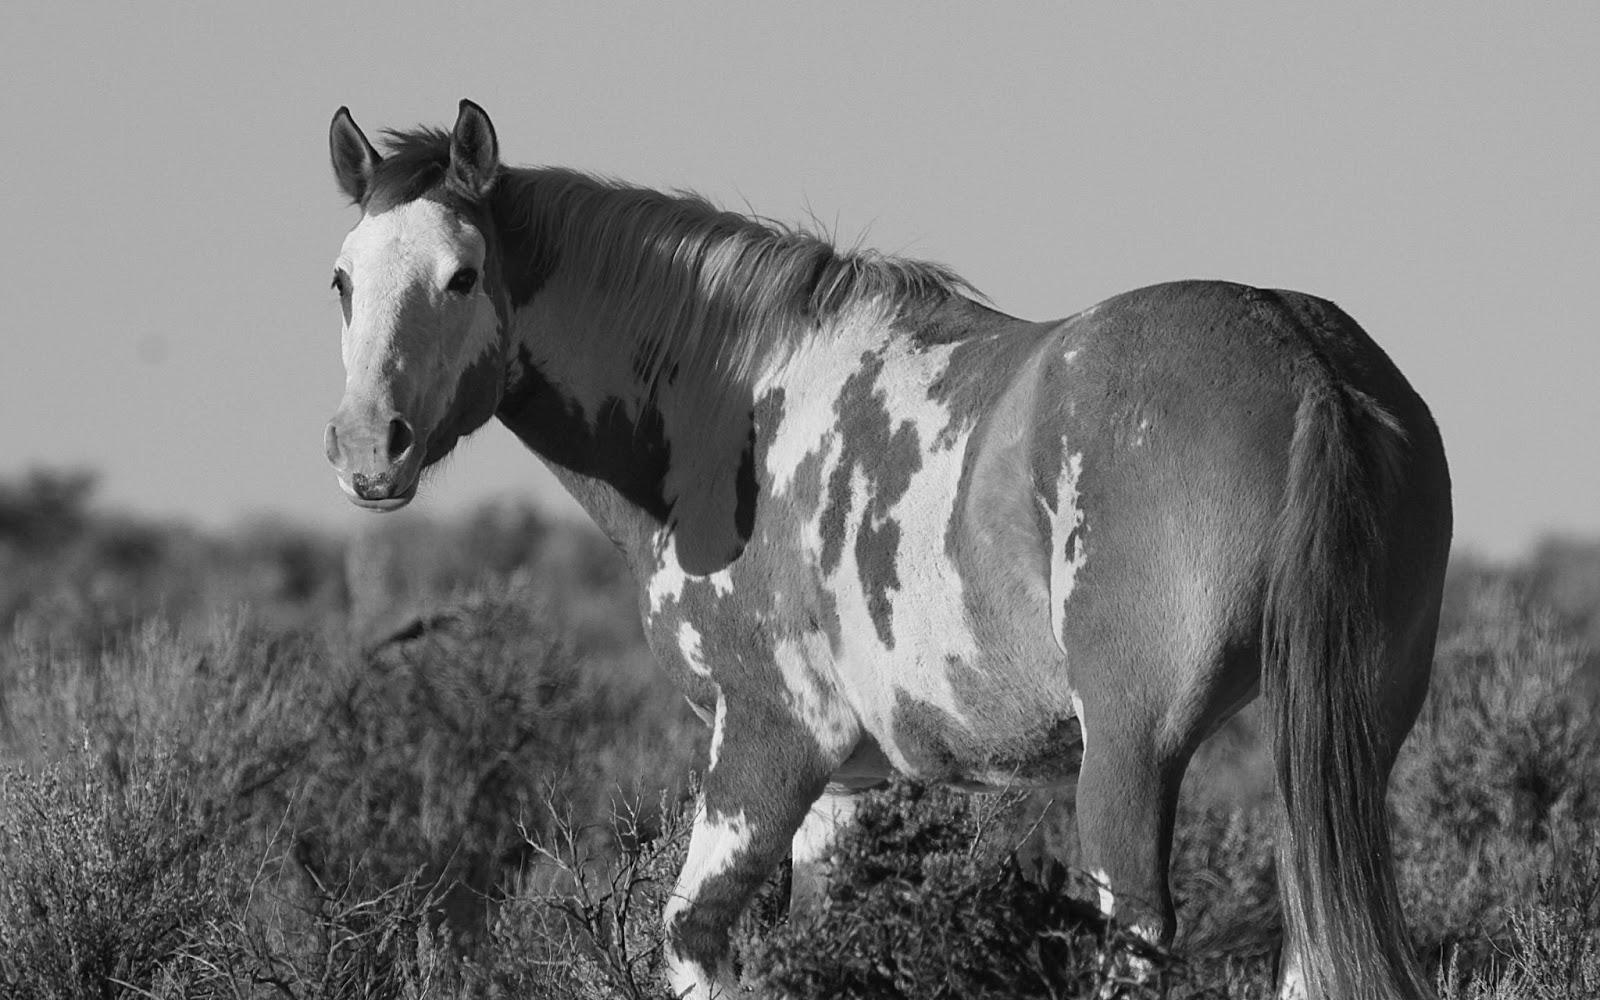 Horse Wallpapers Black And White 1600x1000 Wallpaper Teahub Io